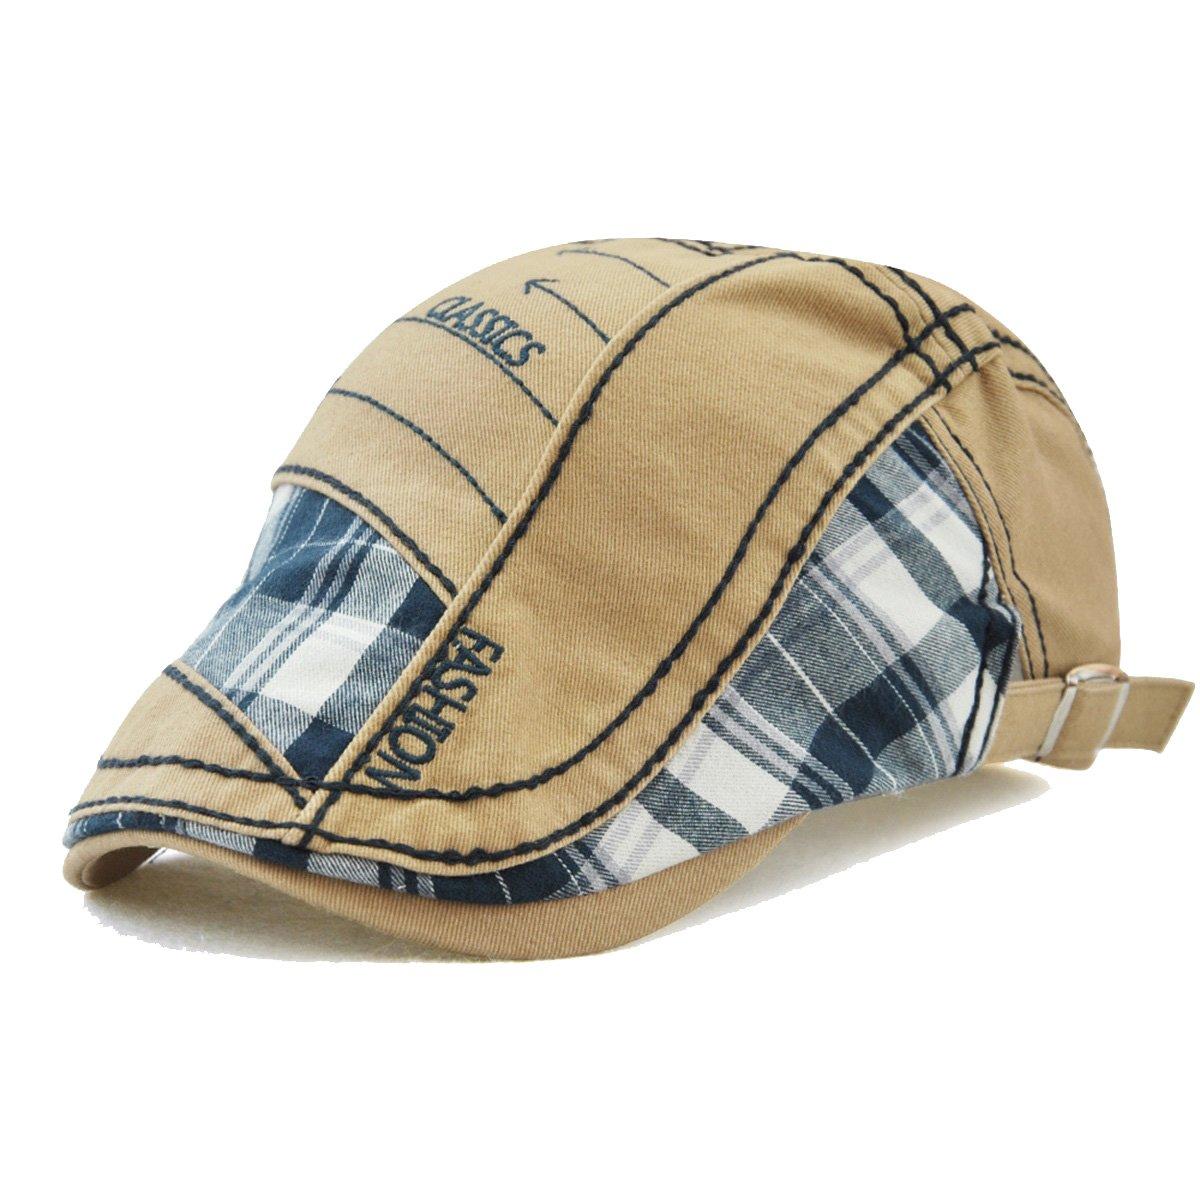 FayTop Men's Cotton Flat Cap Newsboy Ivy Irish Cabbie Scally Cap Cabbie Driving Caps Hats E90-New-US